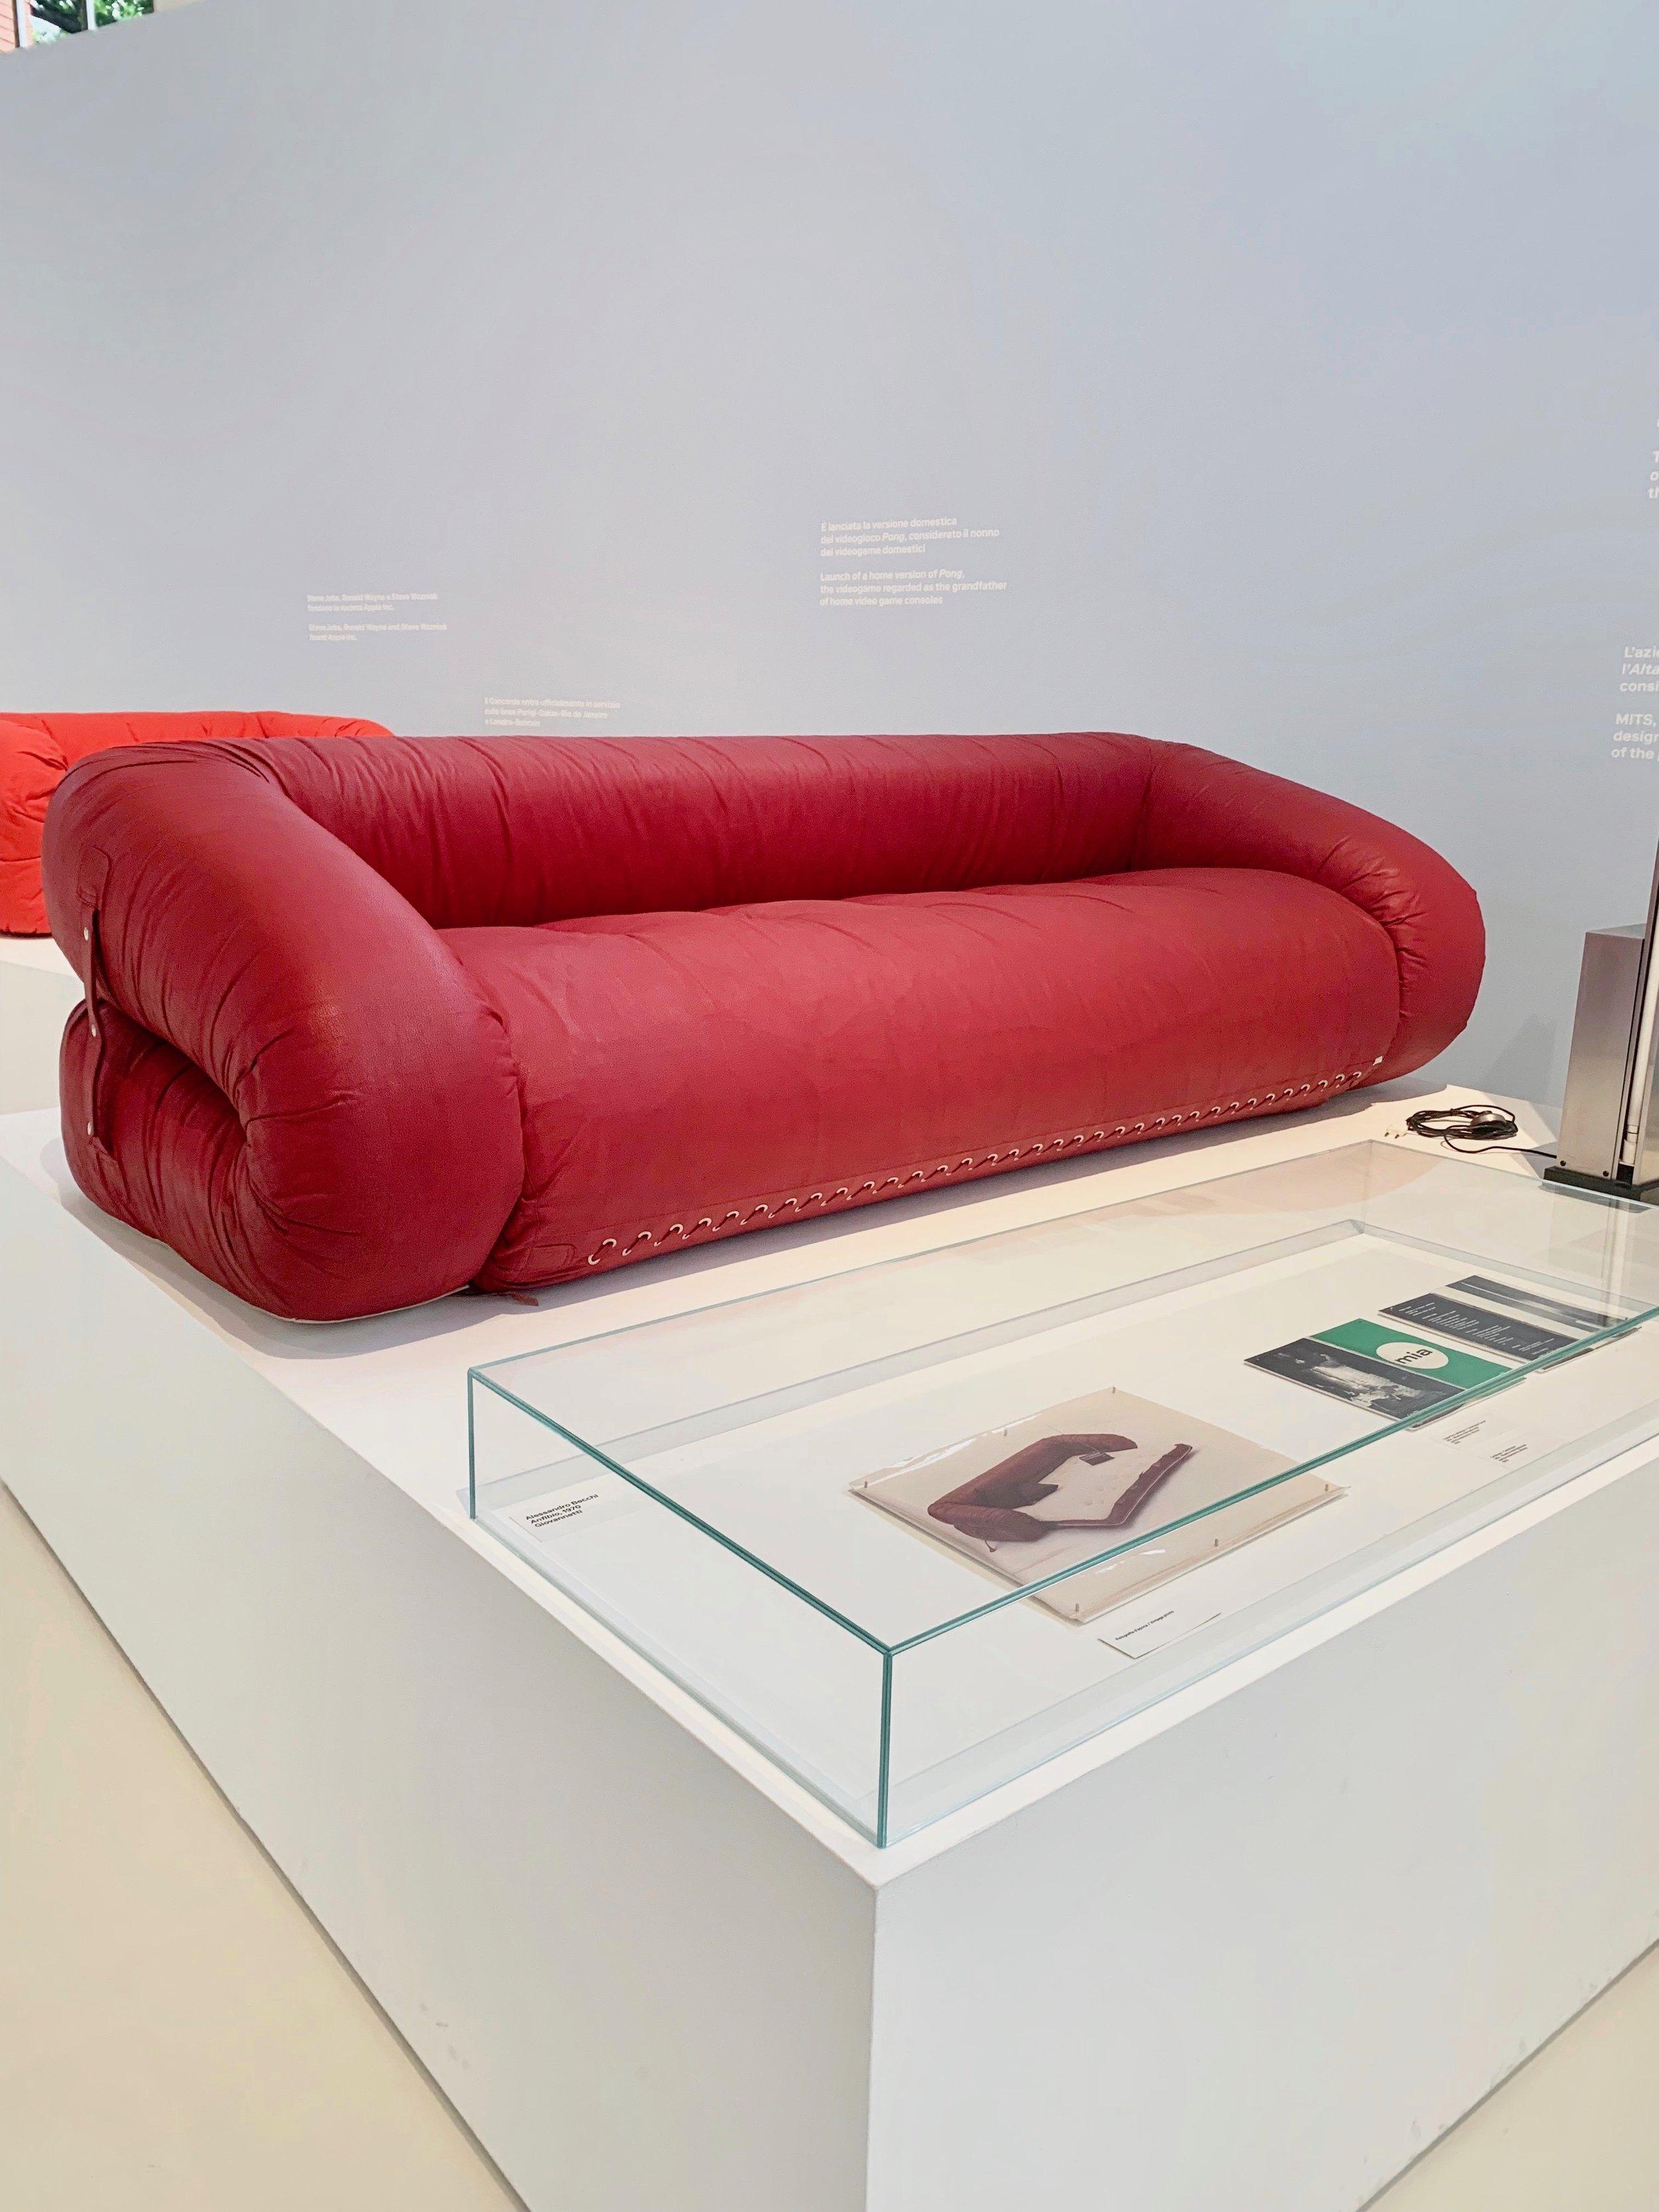 Museum Of Italian Design - Italian Mid Century Modern Furniture Designitalia00042.jpeg